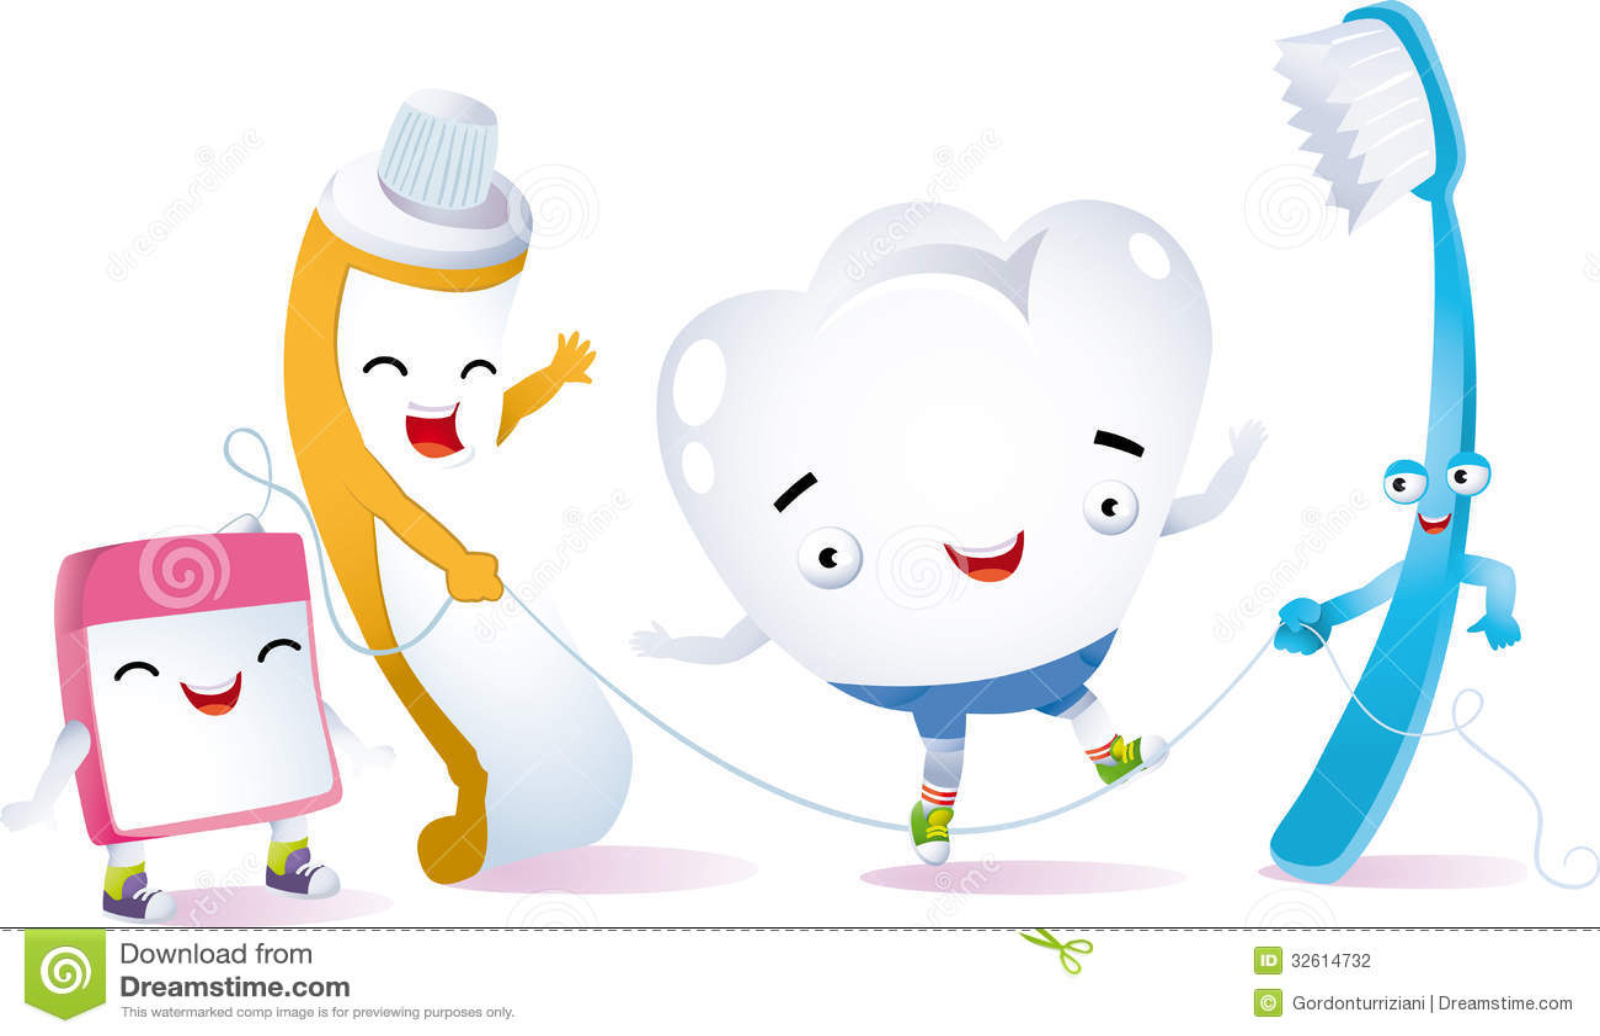 Dental Hygiene Business Cards - Best Business 2017